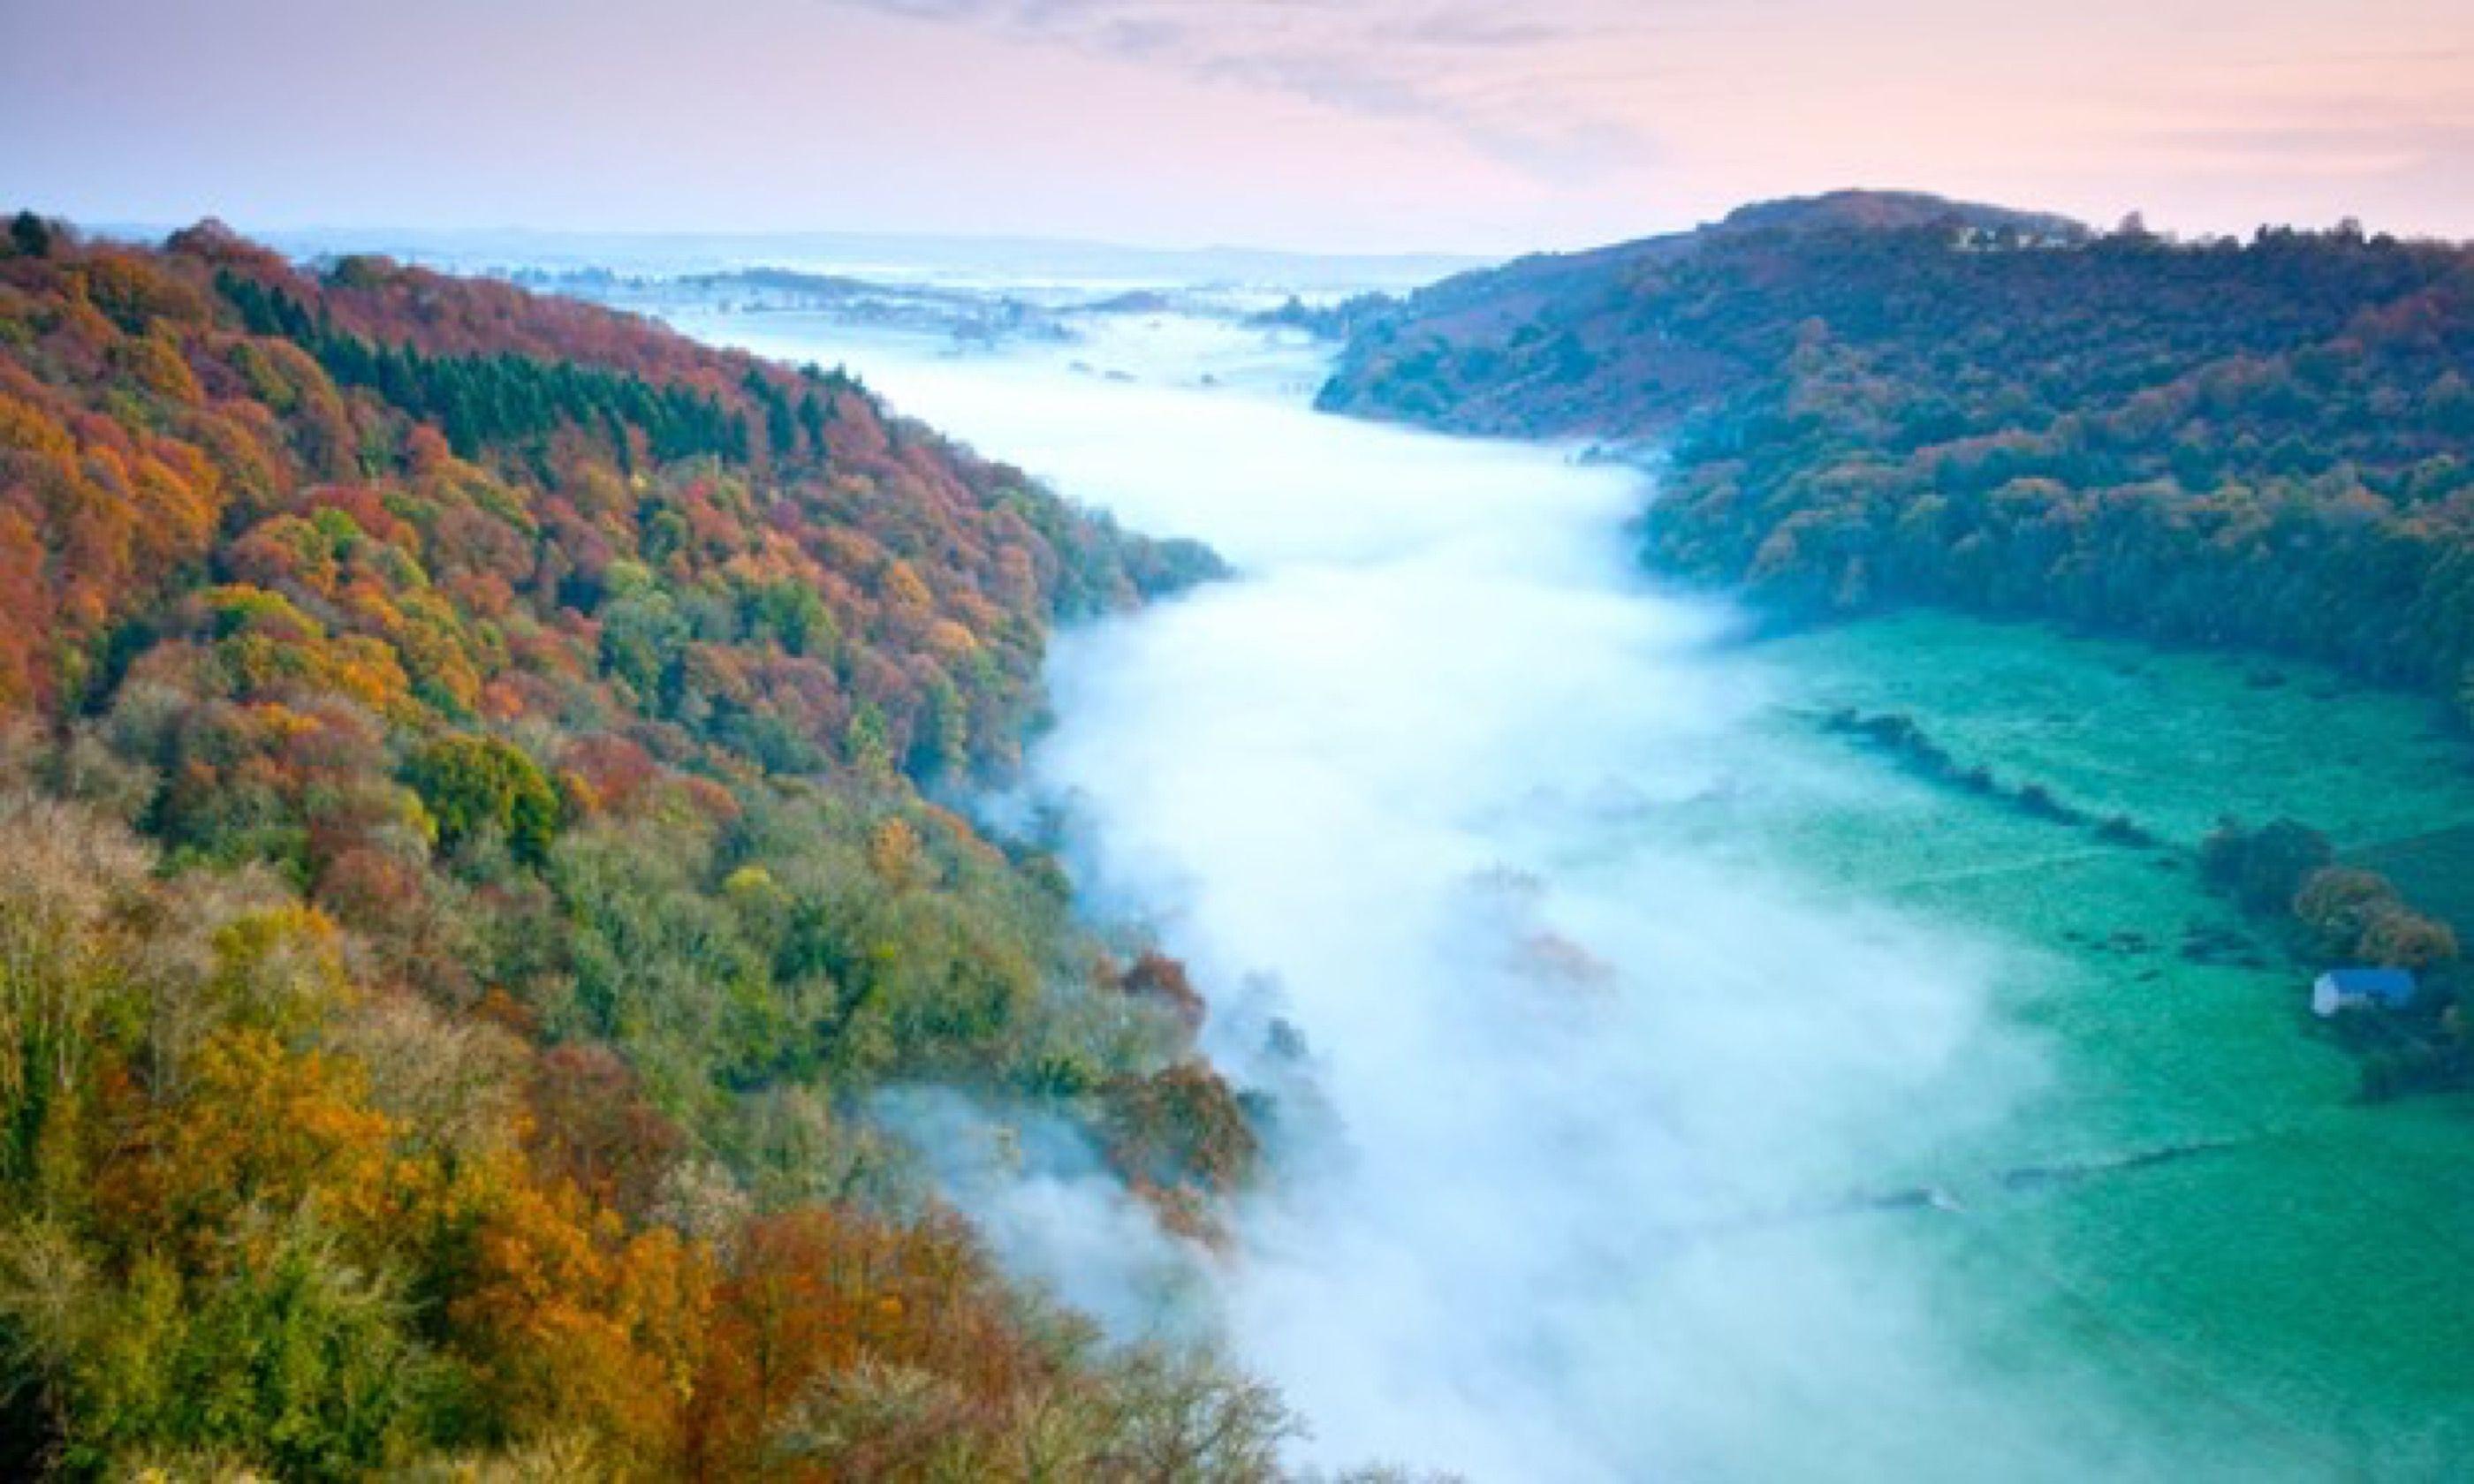 Autumn in Herefordshire (Shutterstock)